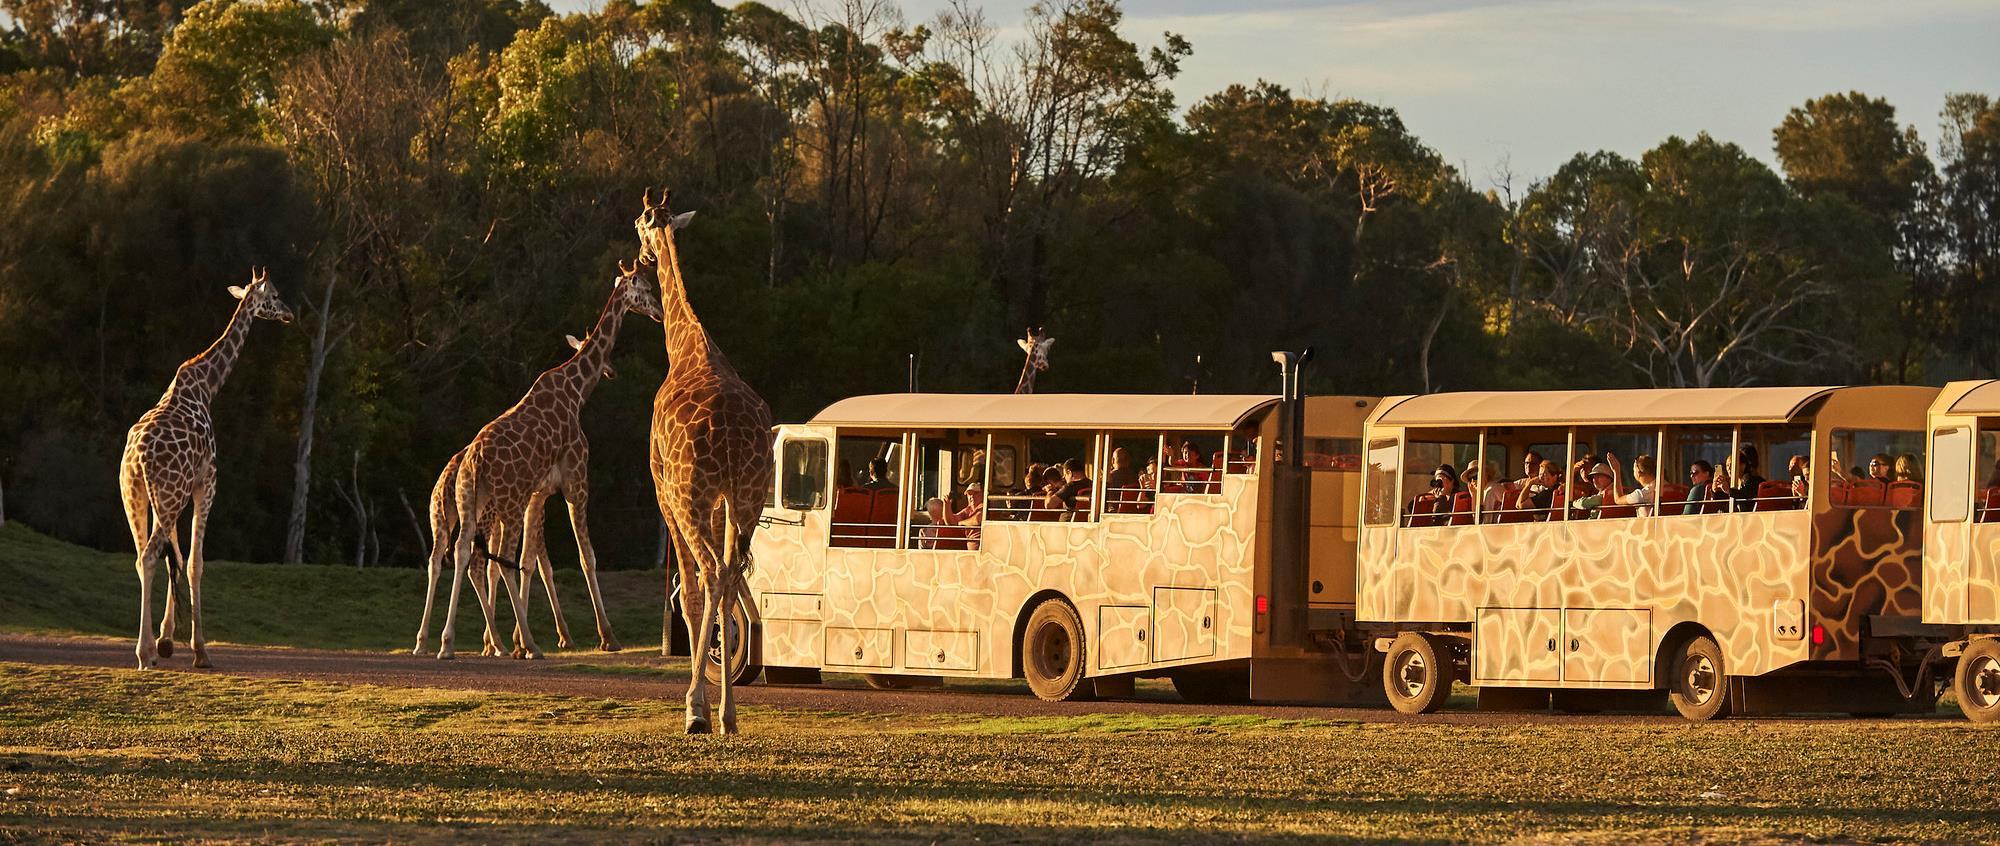 Safari bus driving across savannah with four giraffes walking nearby